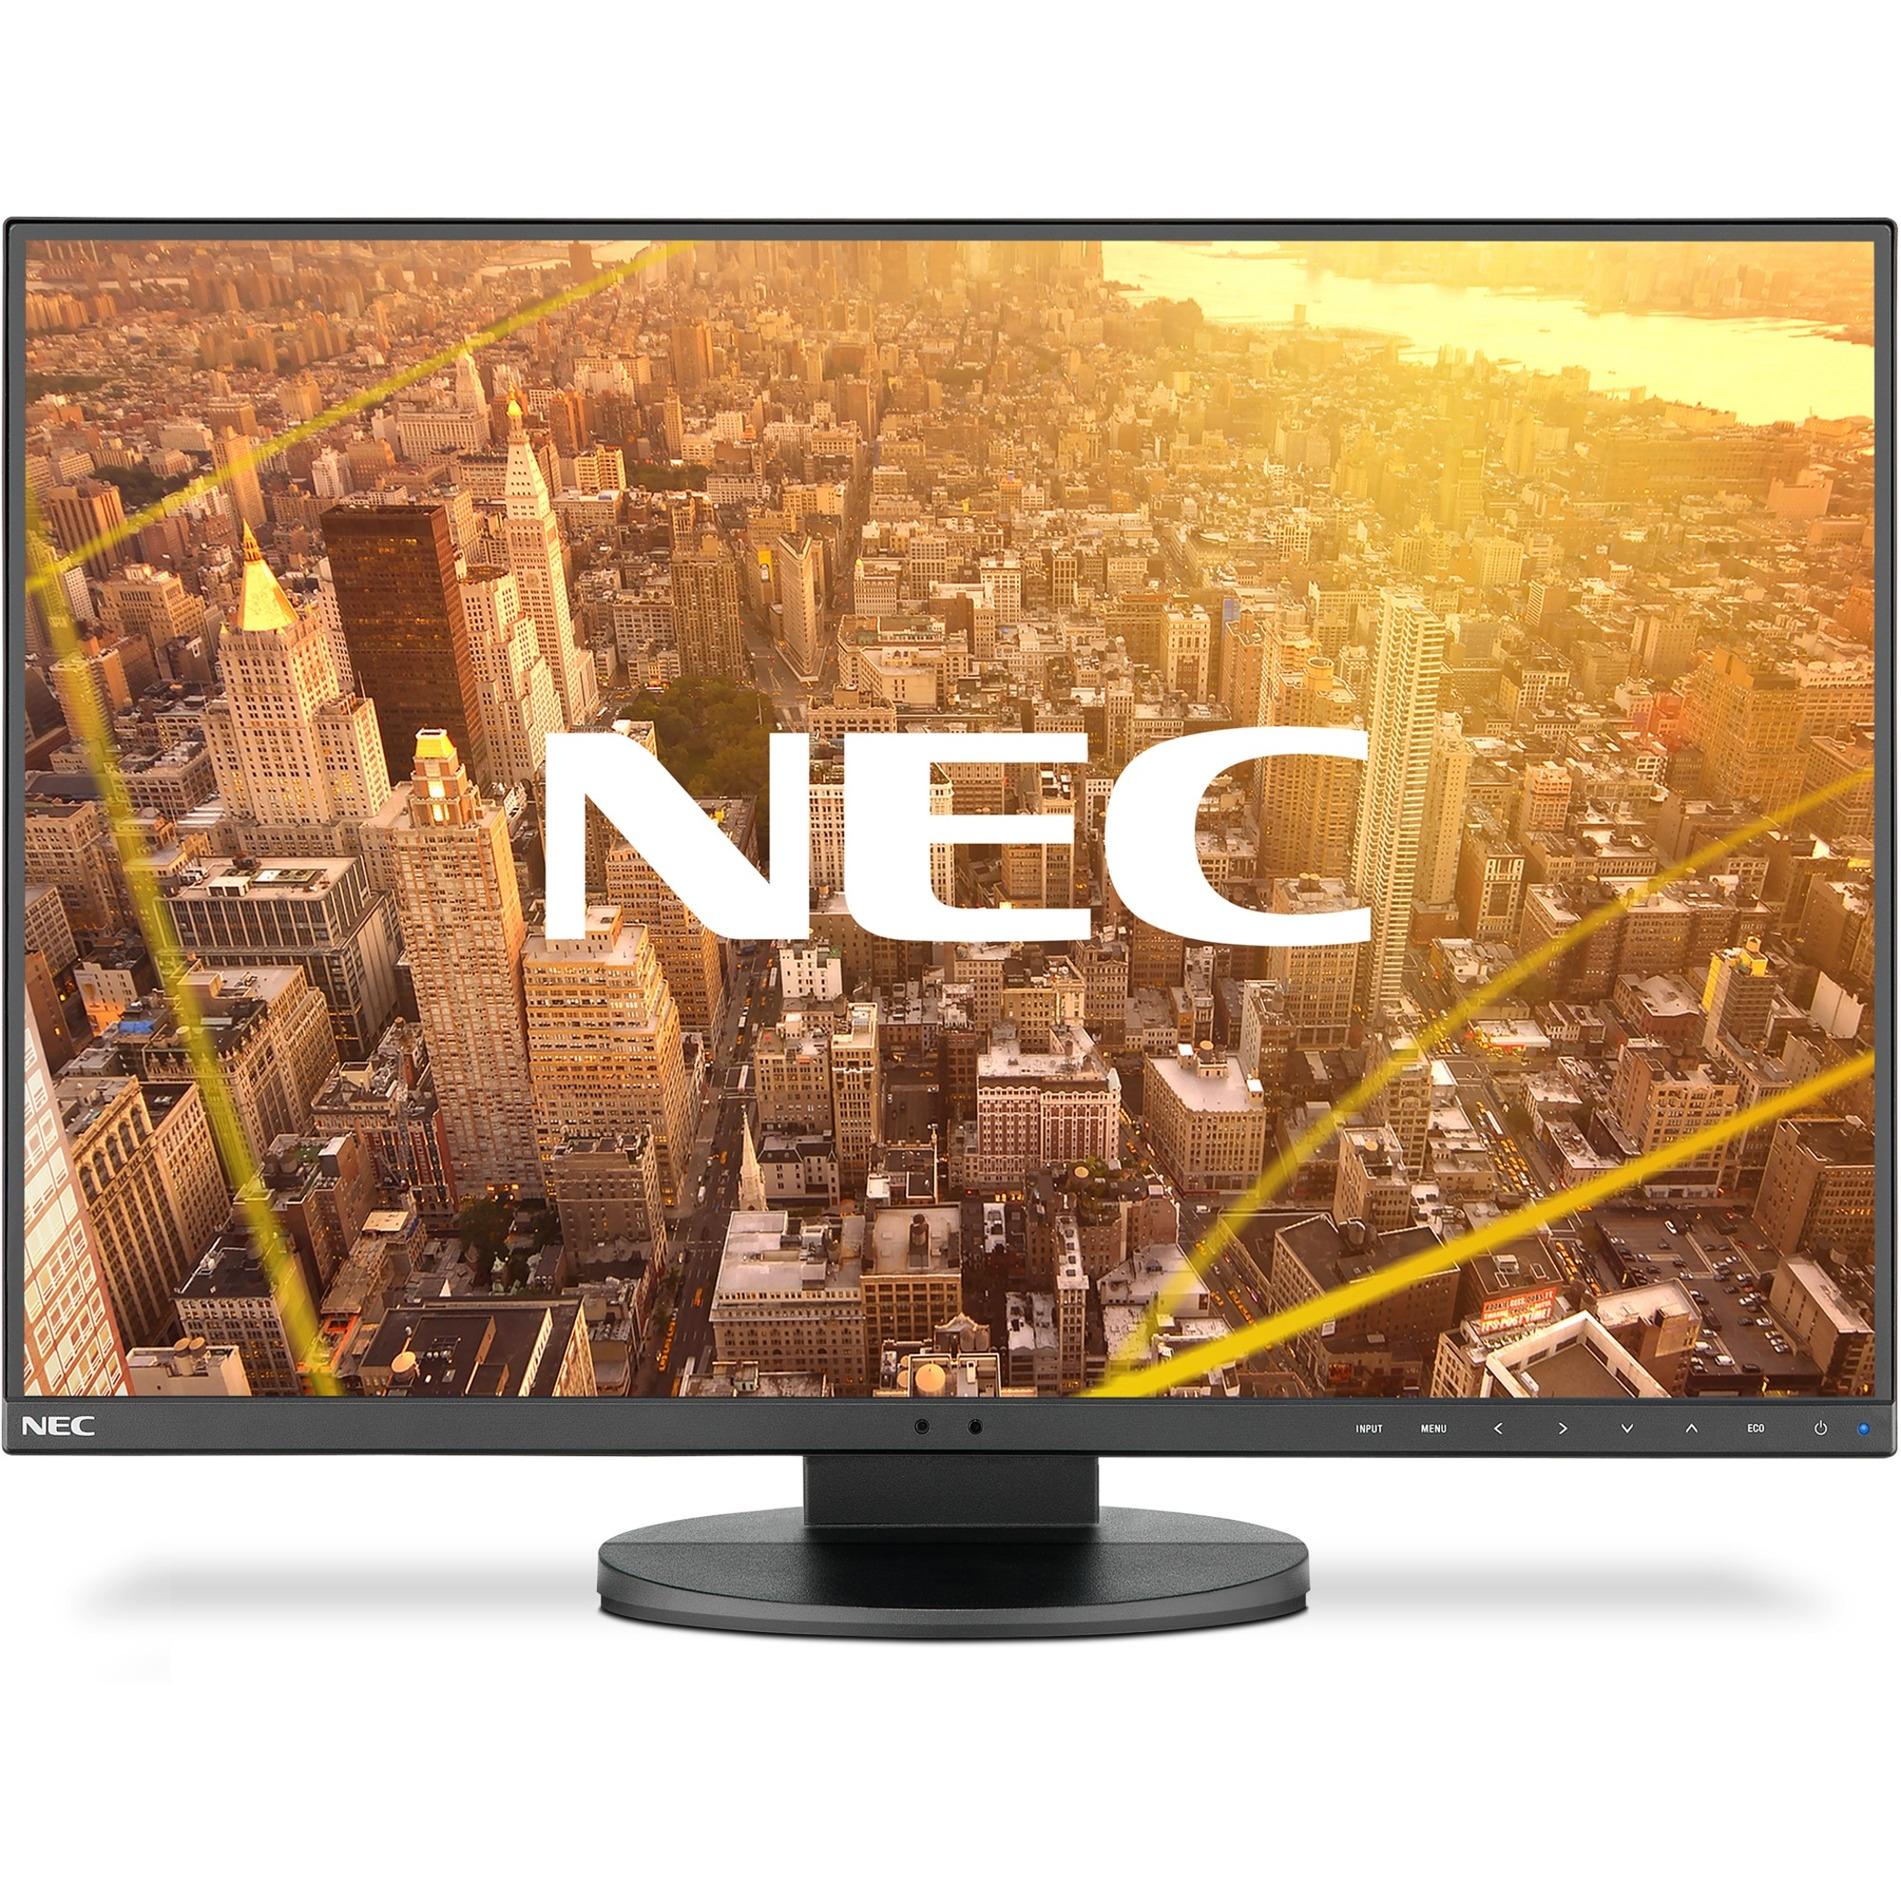 "MultiSync EA241WU pantalla para PC 61 cm (24"") 1920 x 1200 Pixeles WUXGA LCD Plana Negro, Monitor LED"